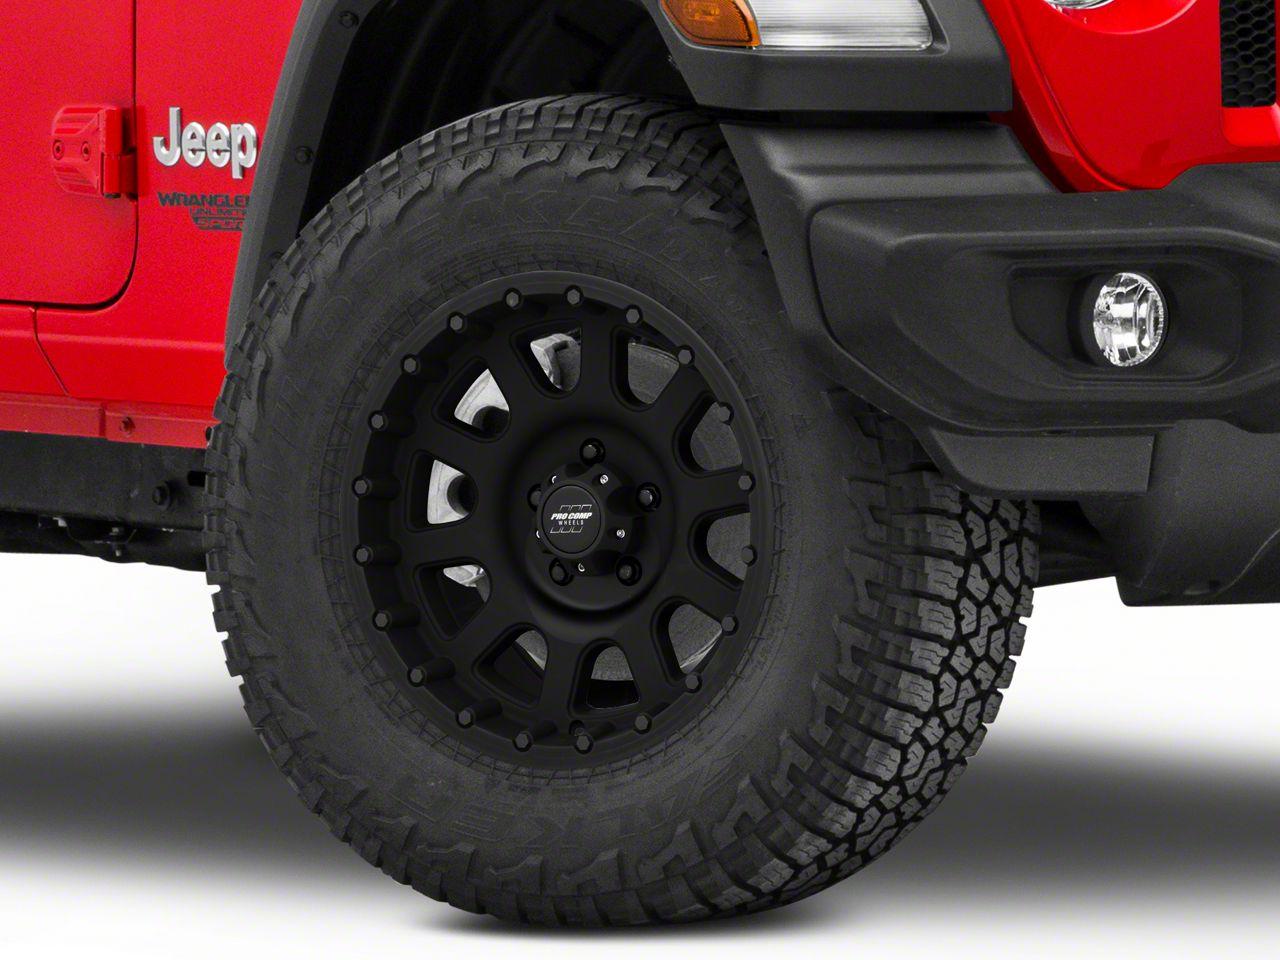 Pro Comp Wheels Alloy Series 7032 Flat Black Wheel - 17x9 (18-19 Jeep Wrangler JL)